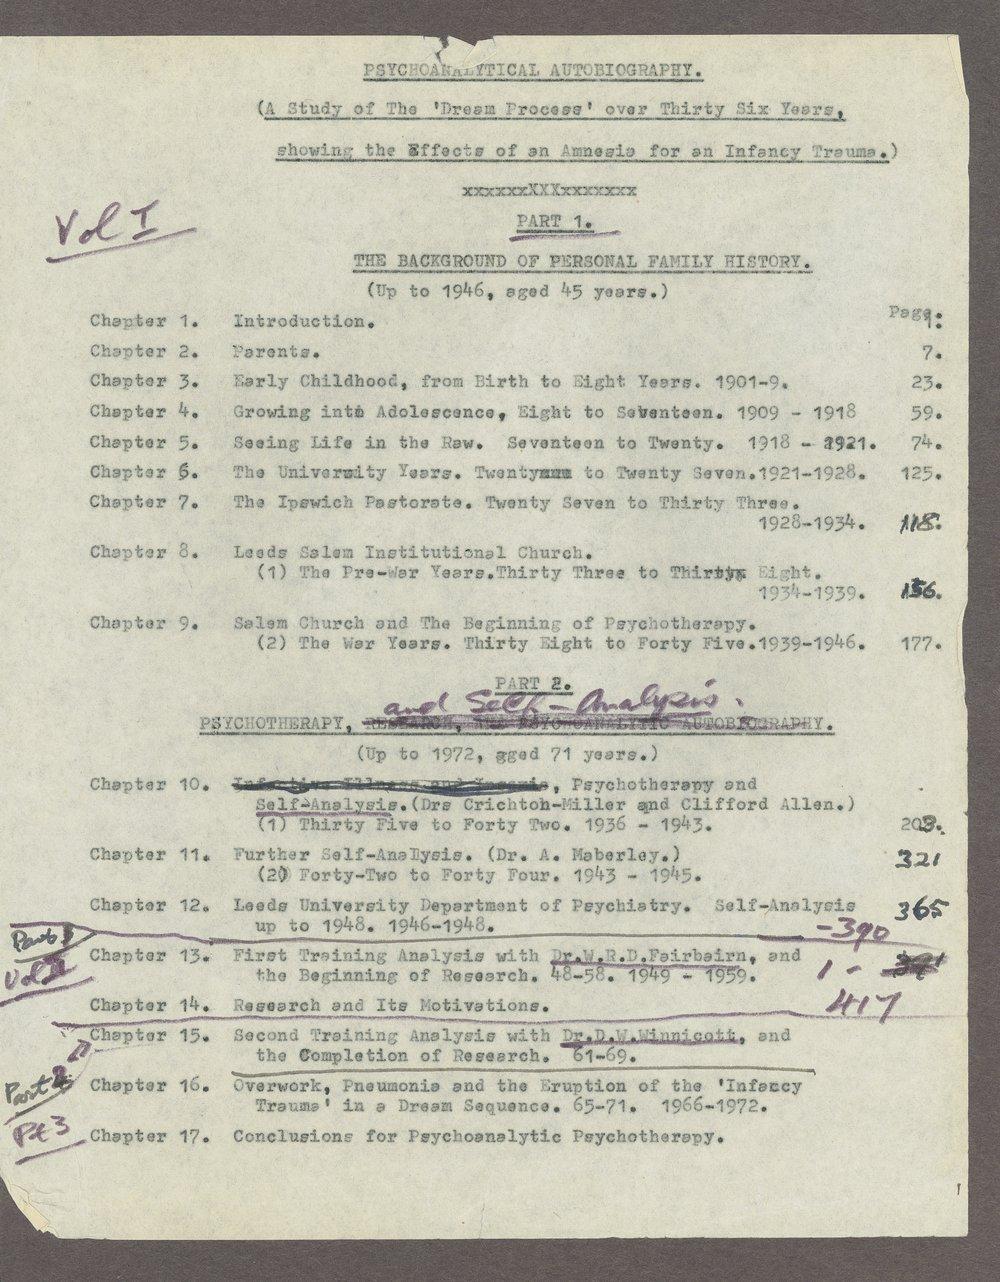 Harry Guntrip manuscripts - 3